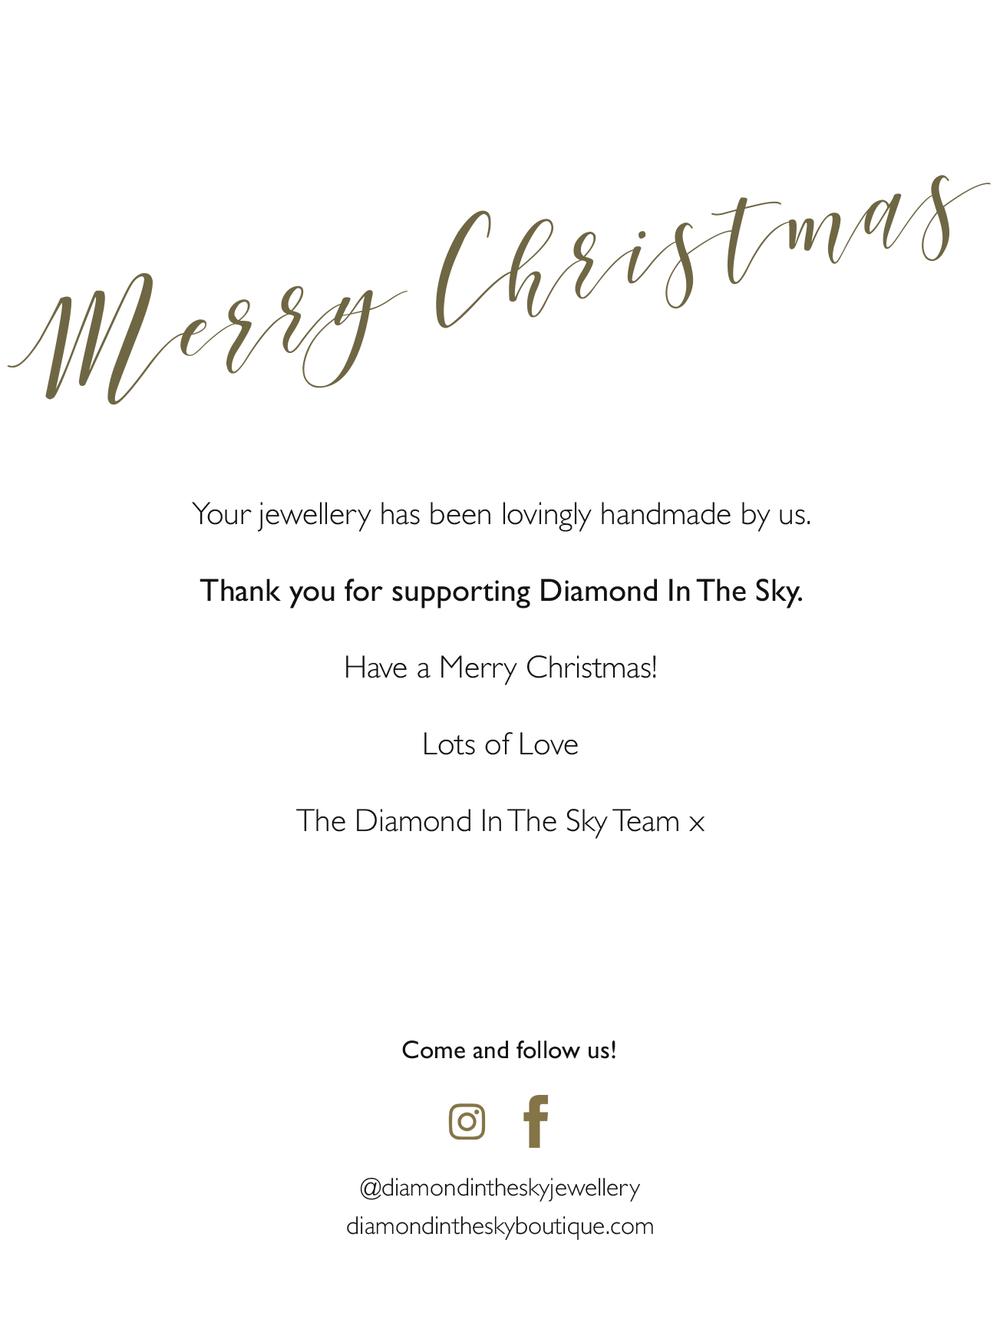 DiamondInTheSky_Christmas_Final Side2.png